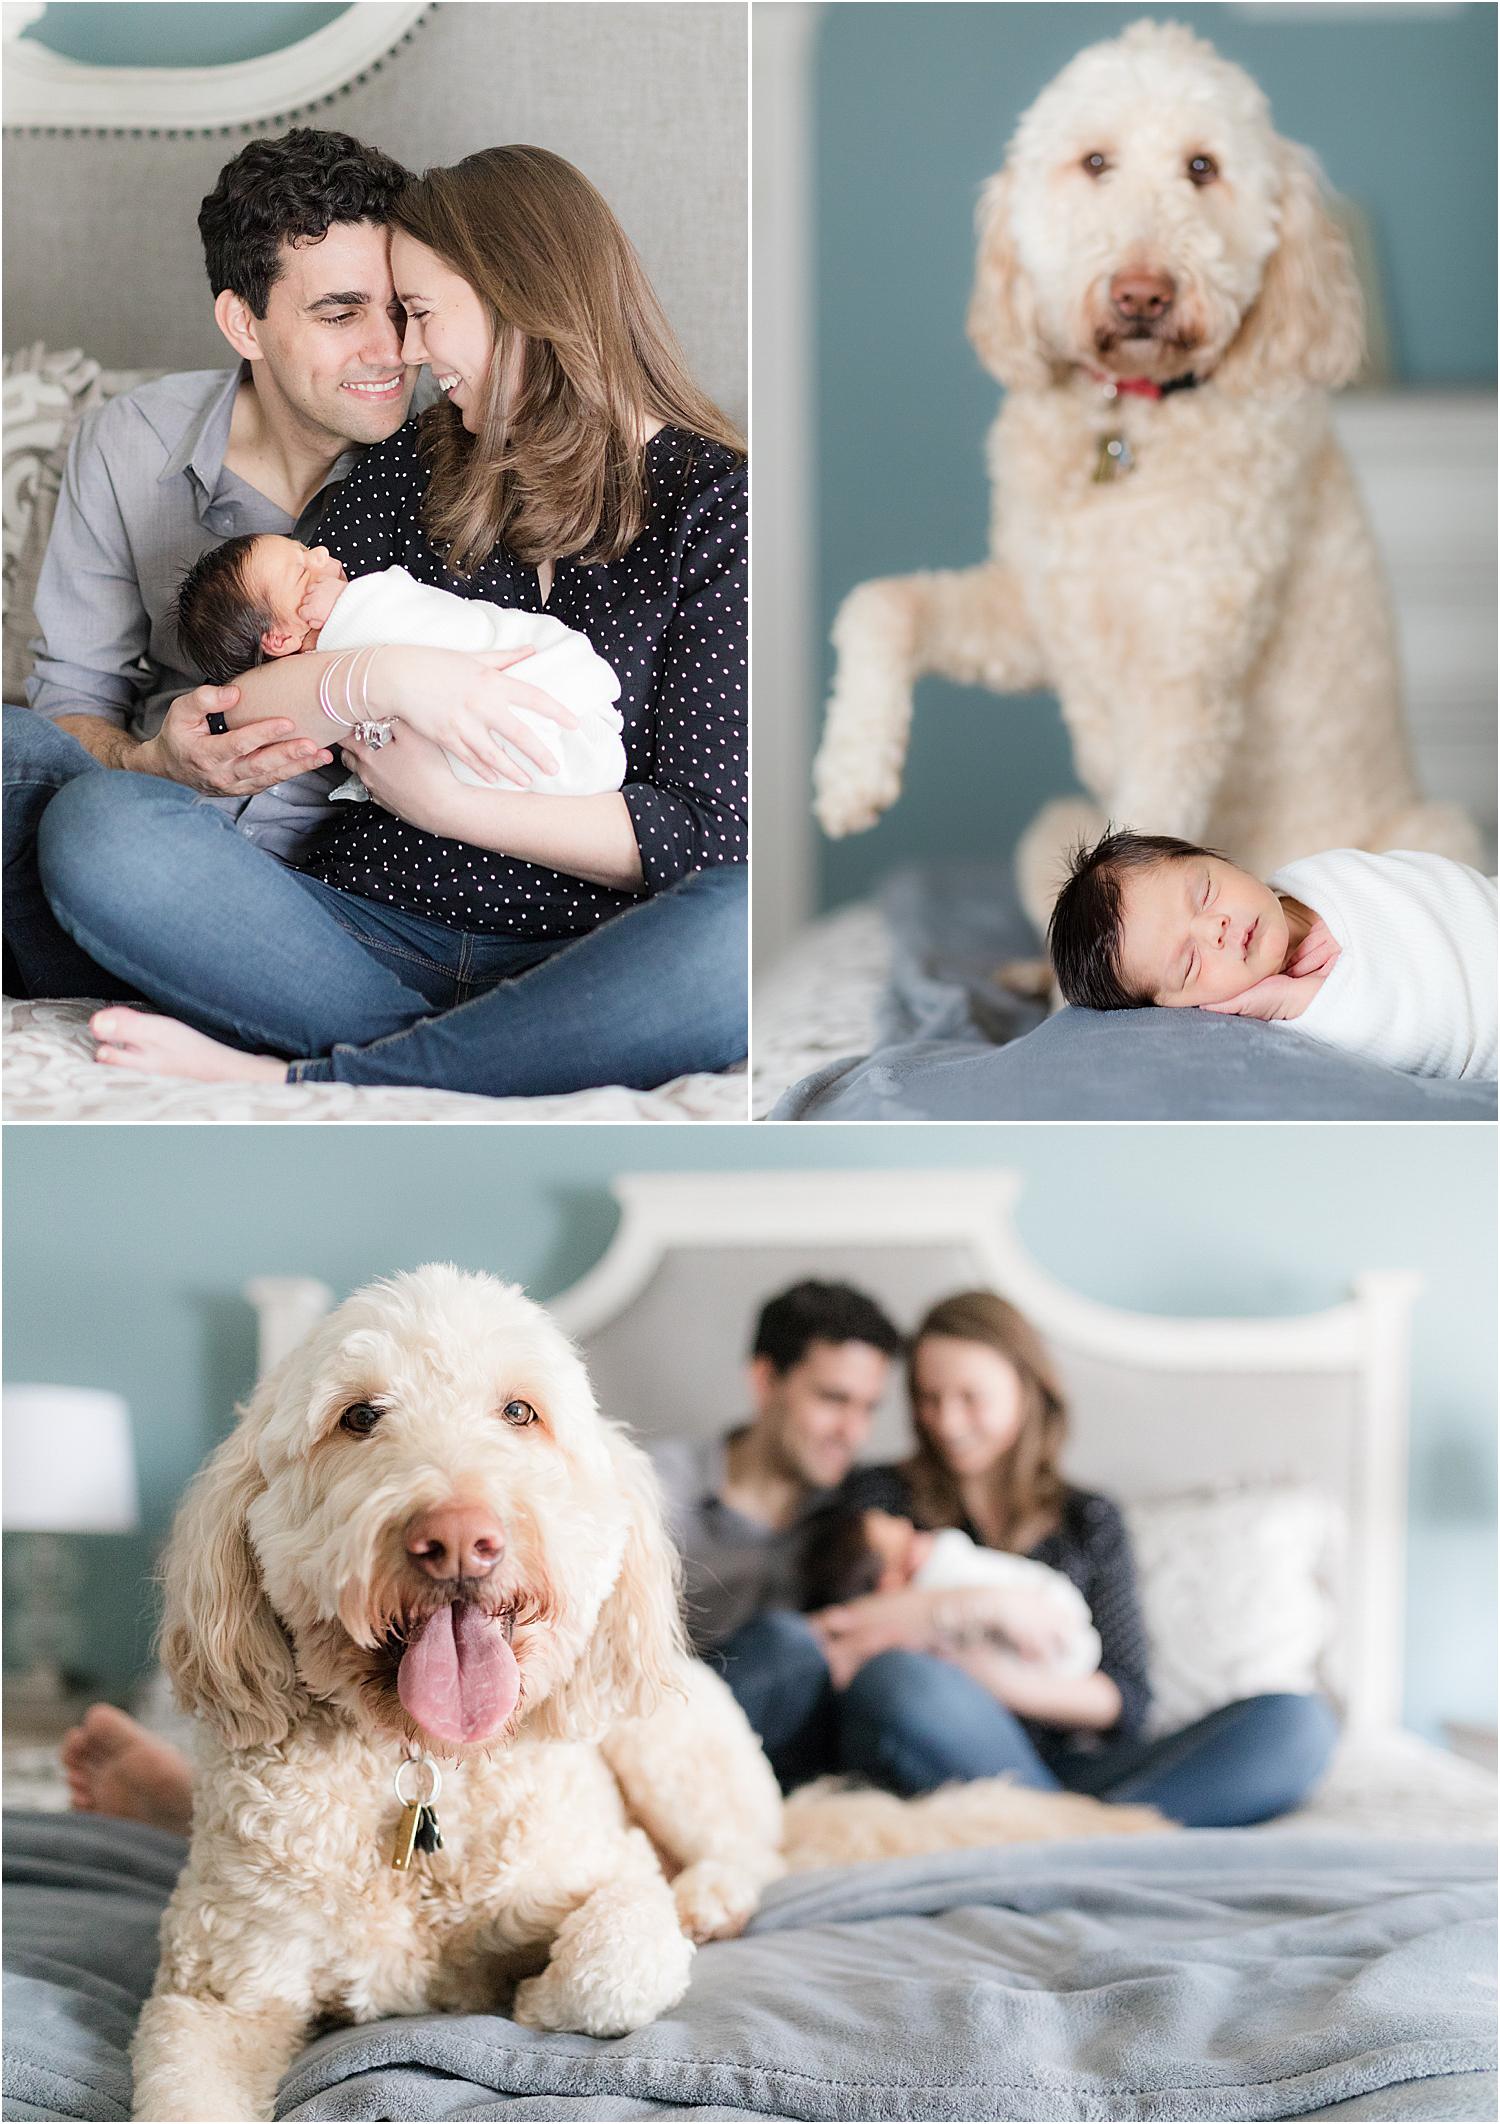 family-newborn-photos-with-a-dog